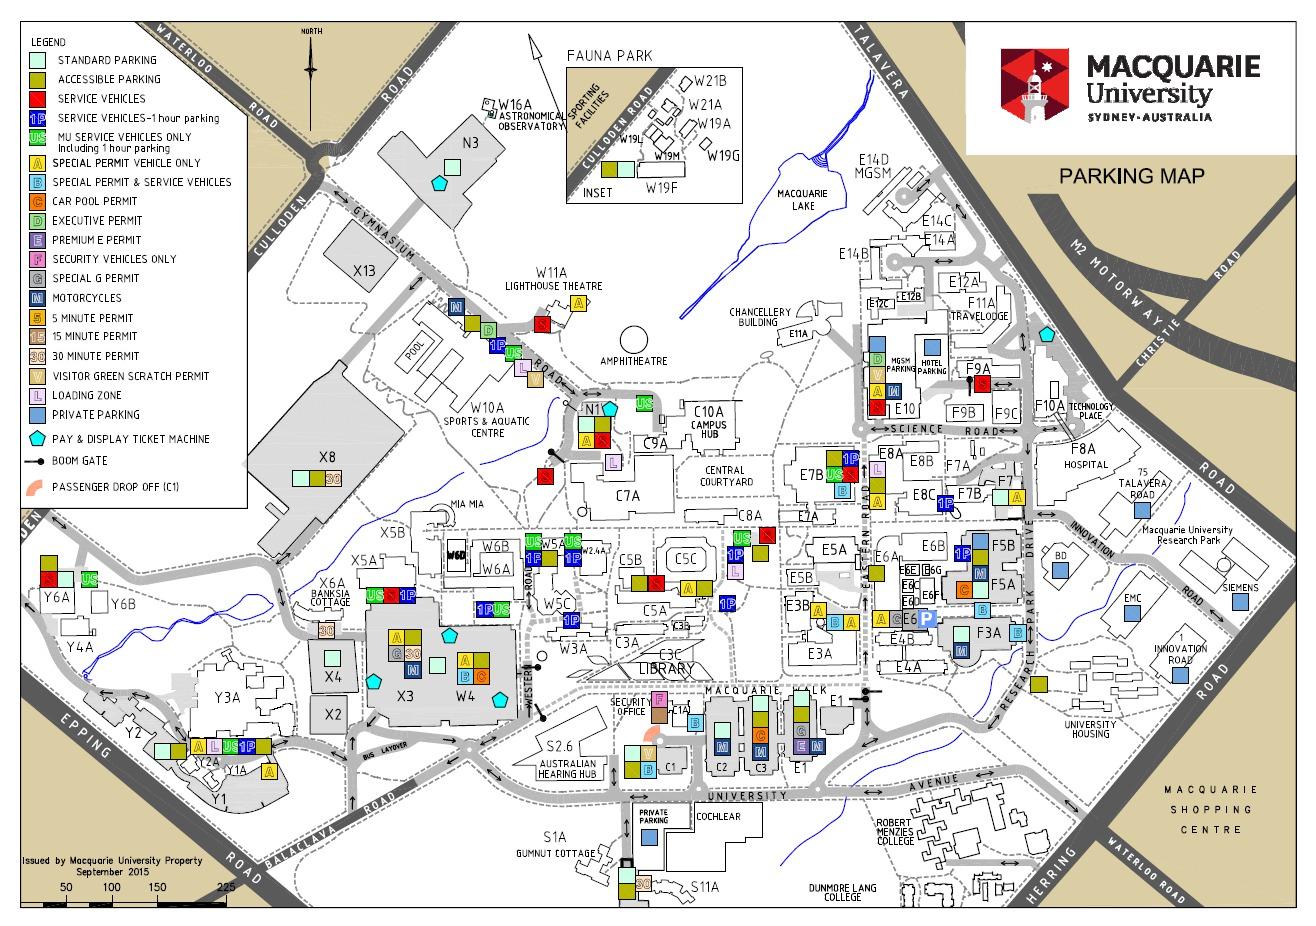 Campus Parking Map